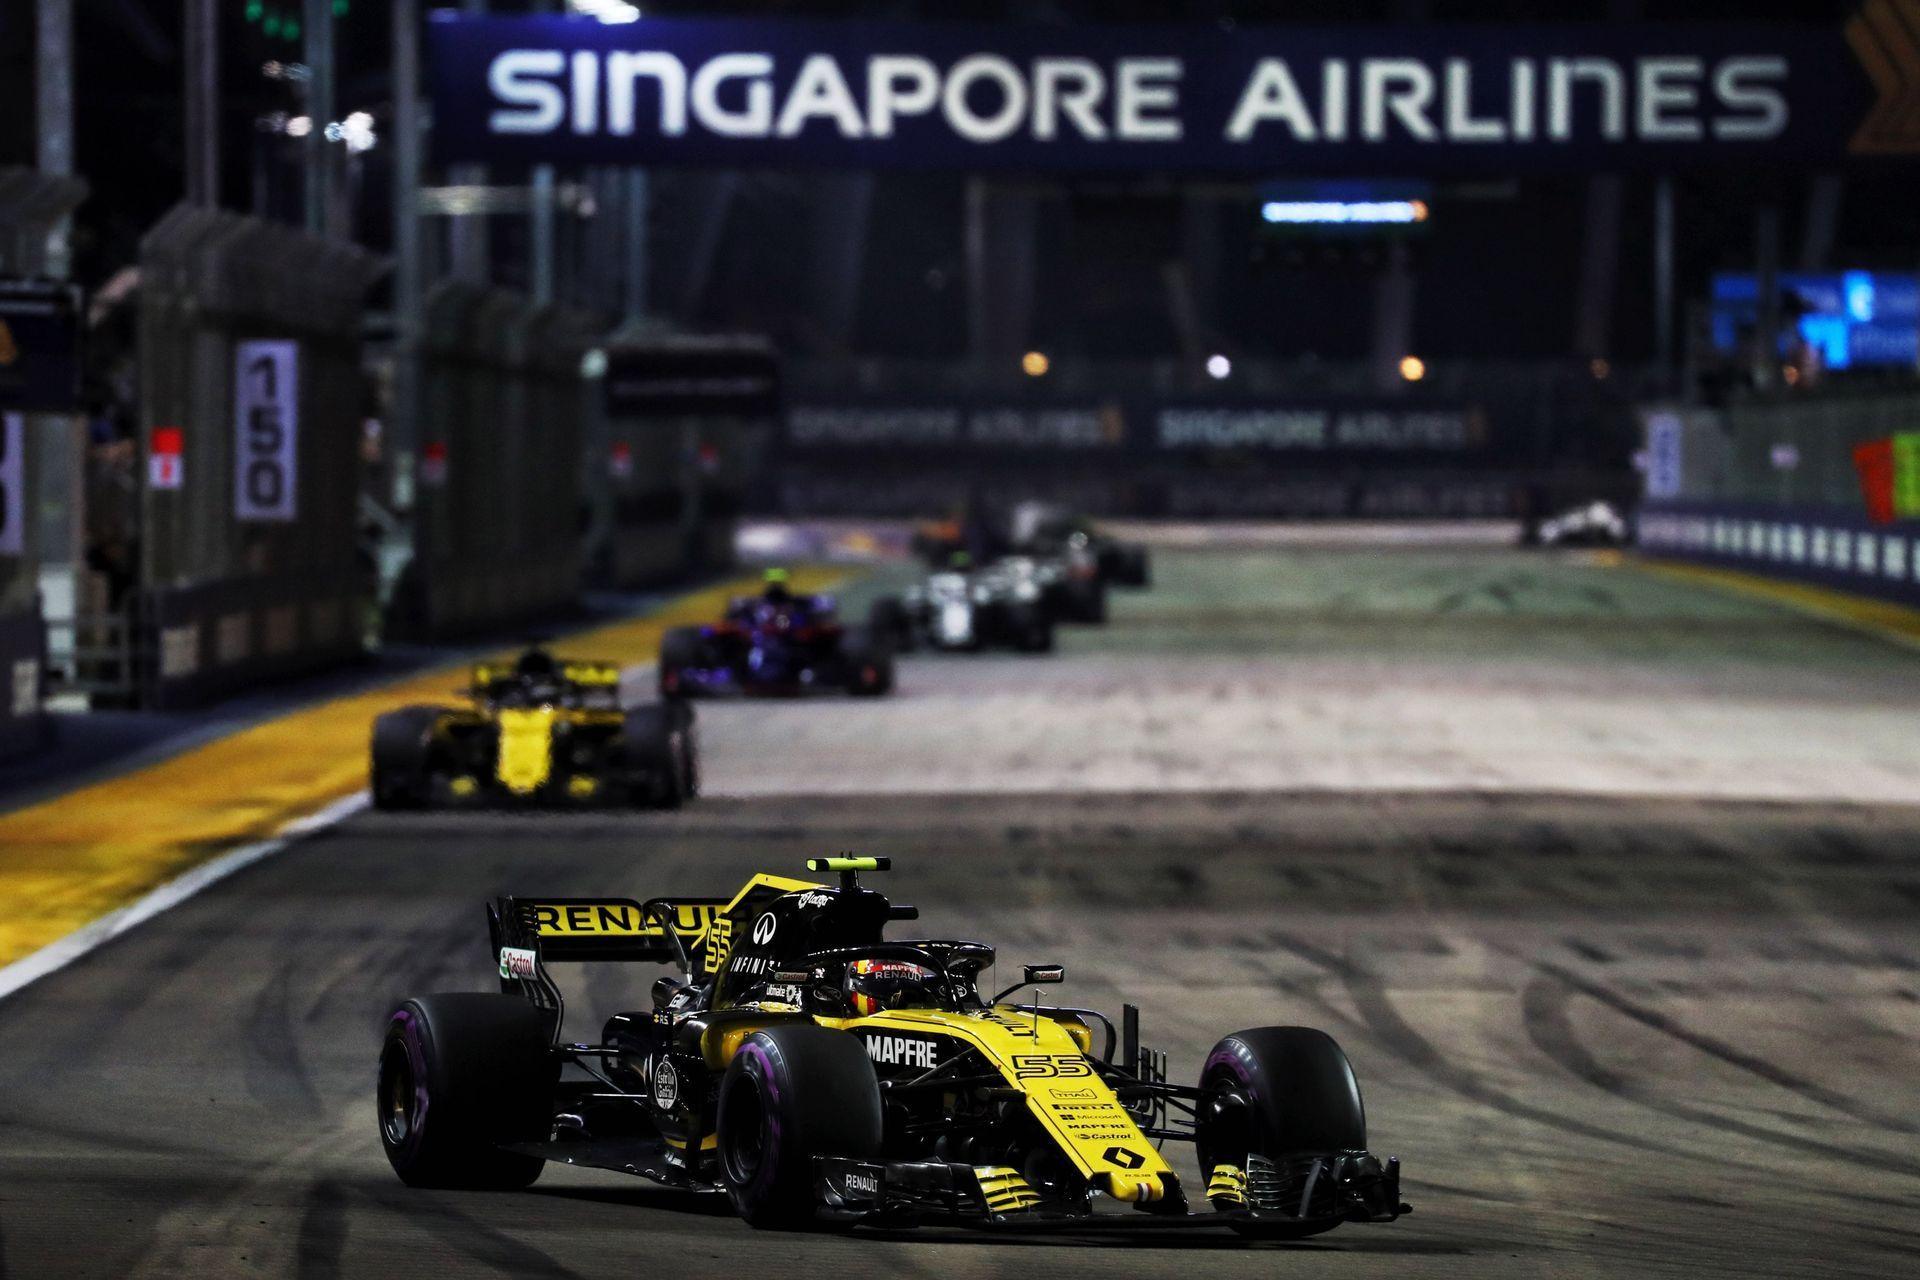 Renault Sport Formula One Team отримала п'ять очок в Сінгапурі